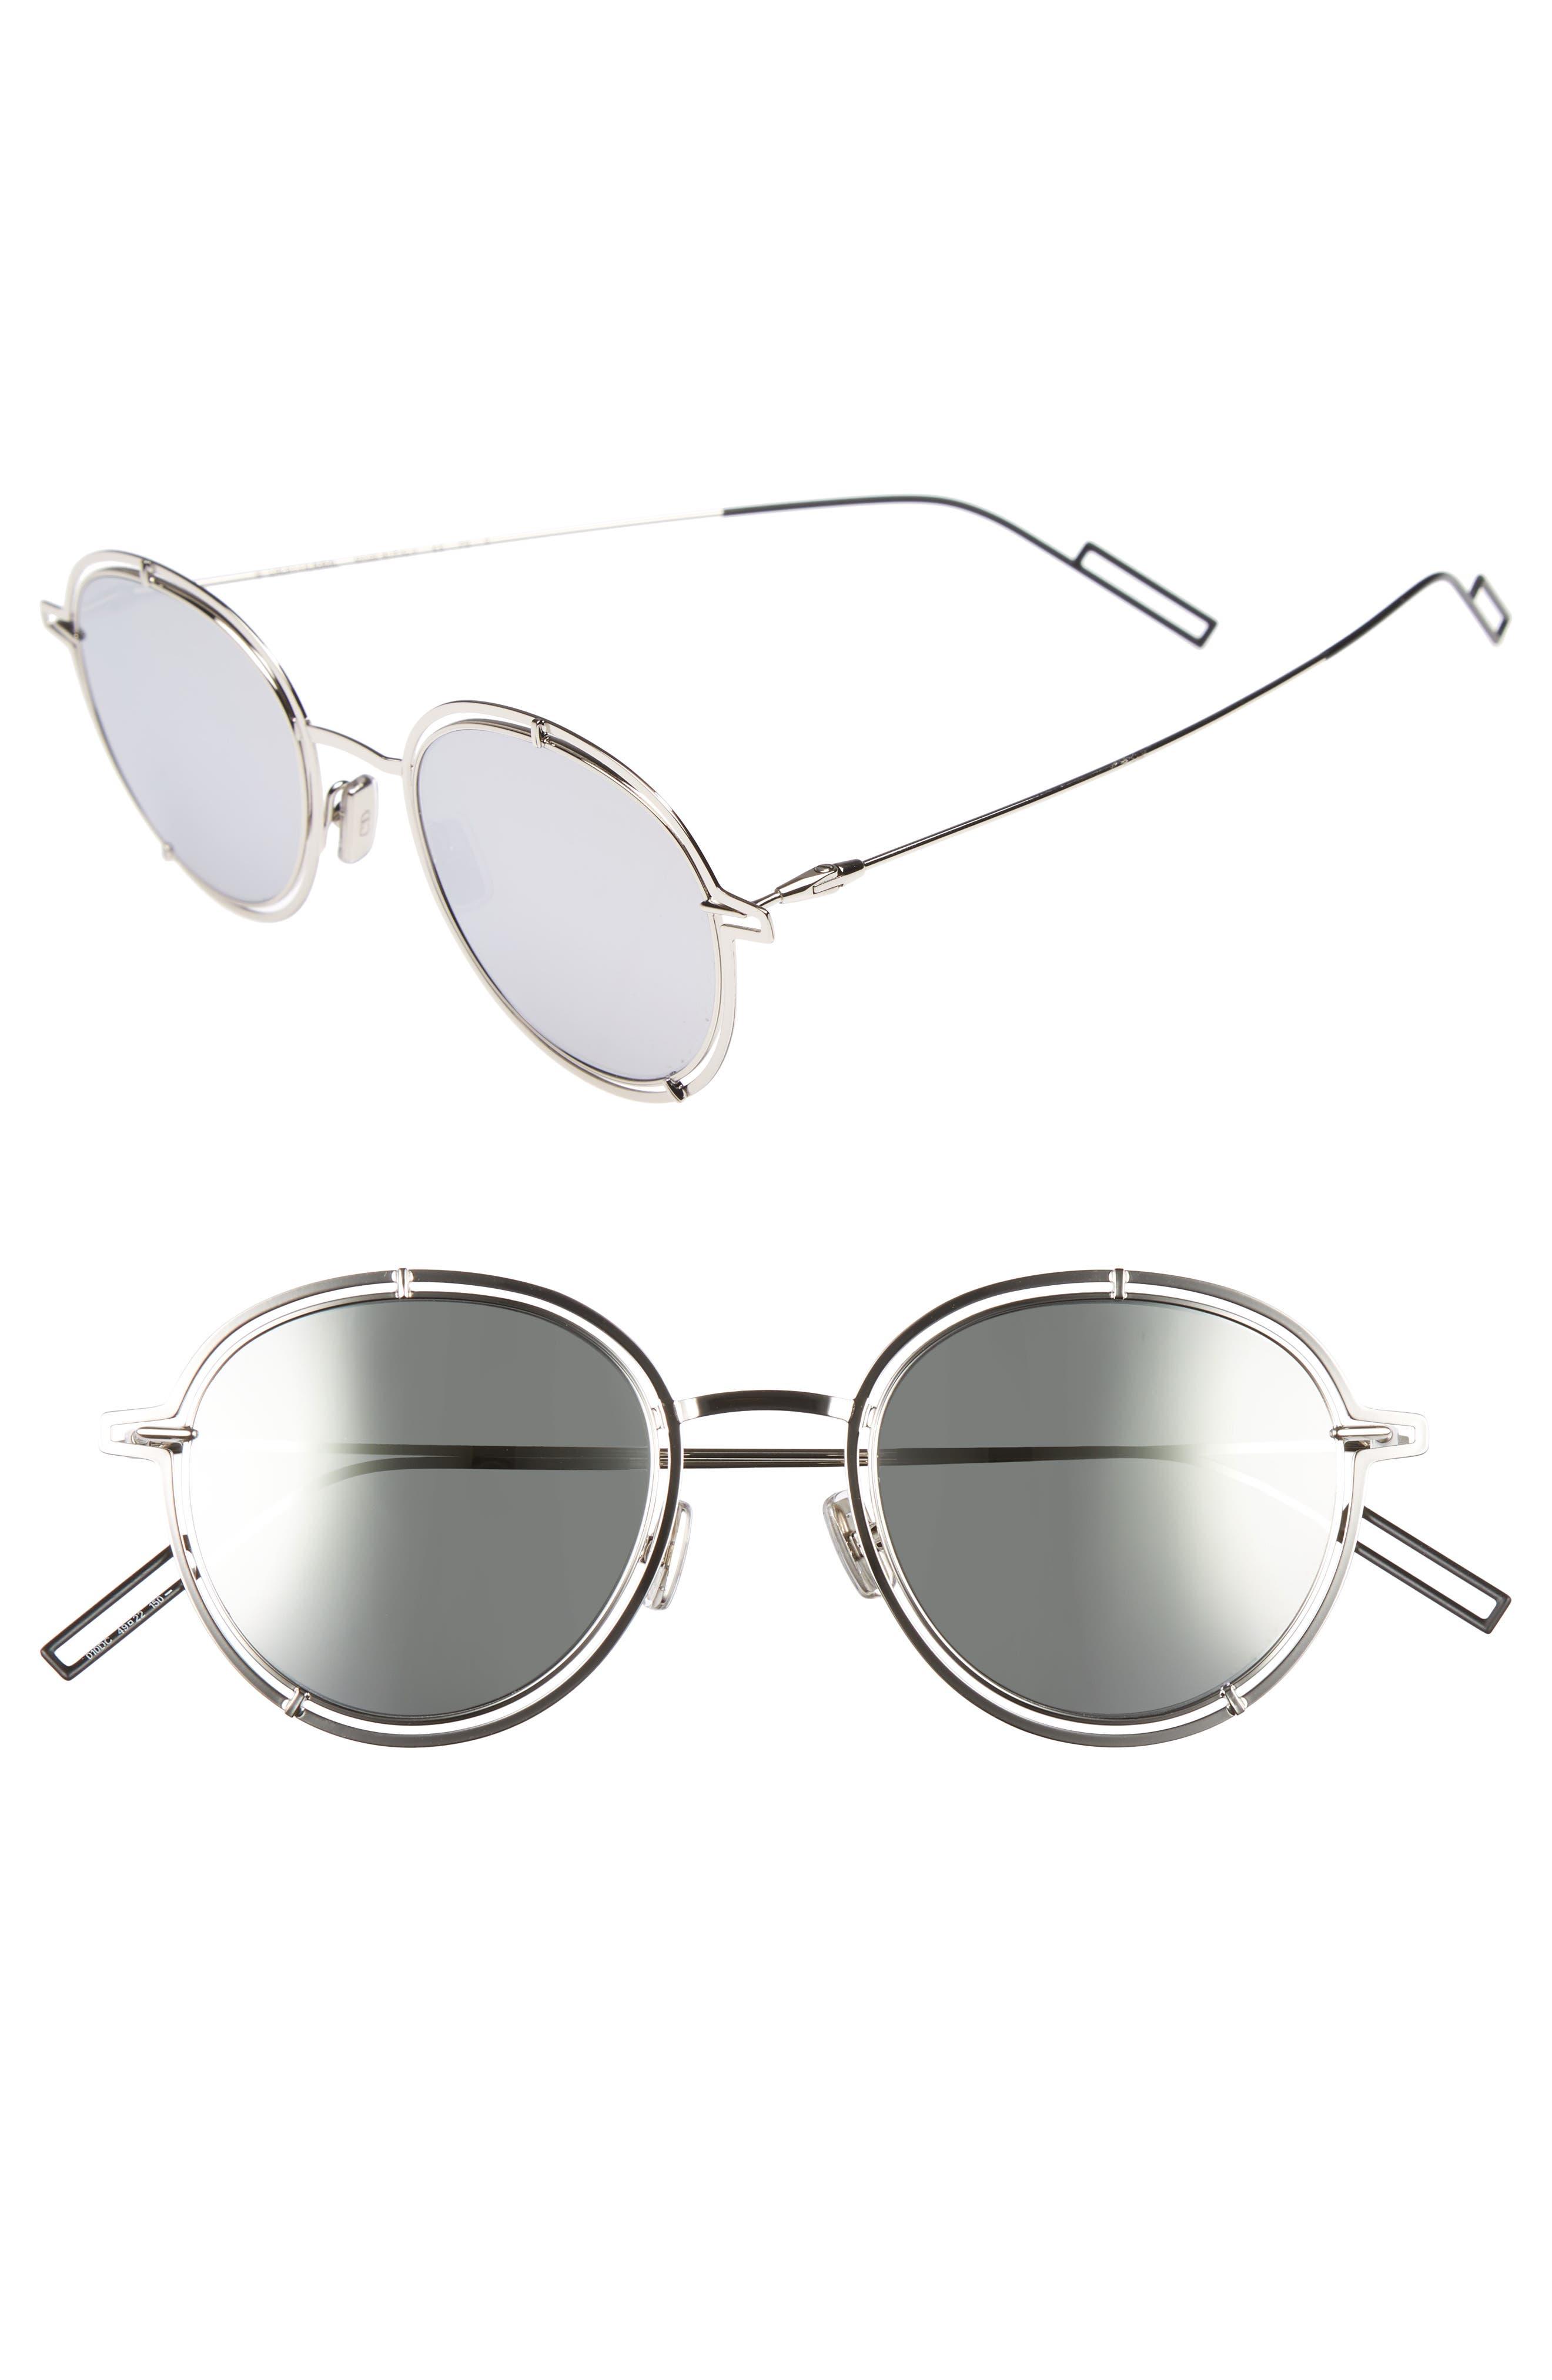 49mm Round Sunglasses,                             Main thumbnail 2, color,